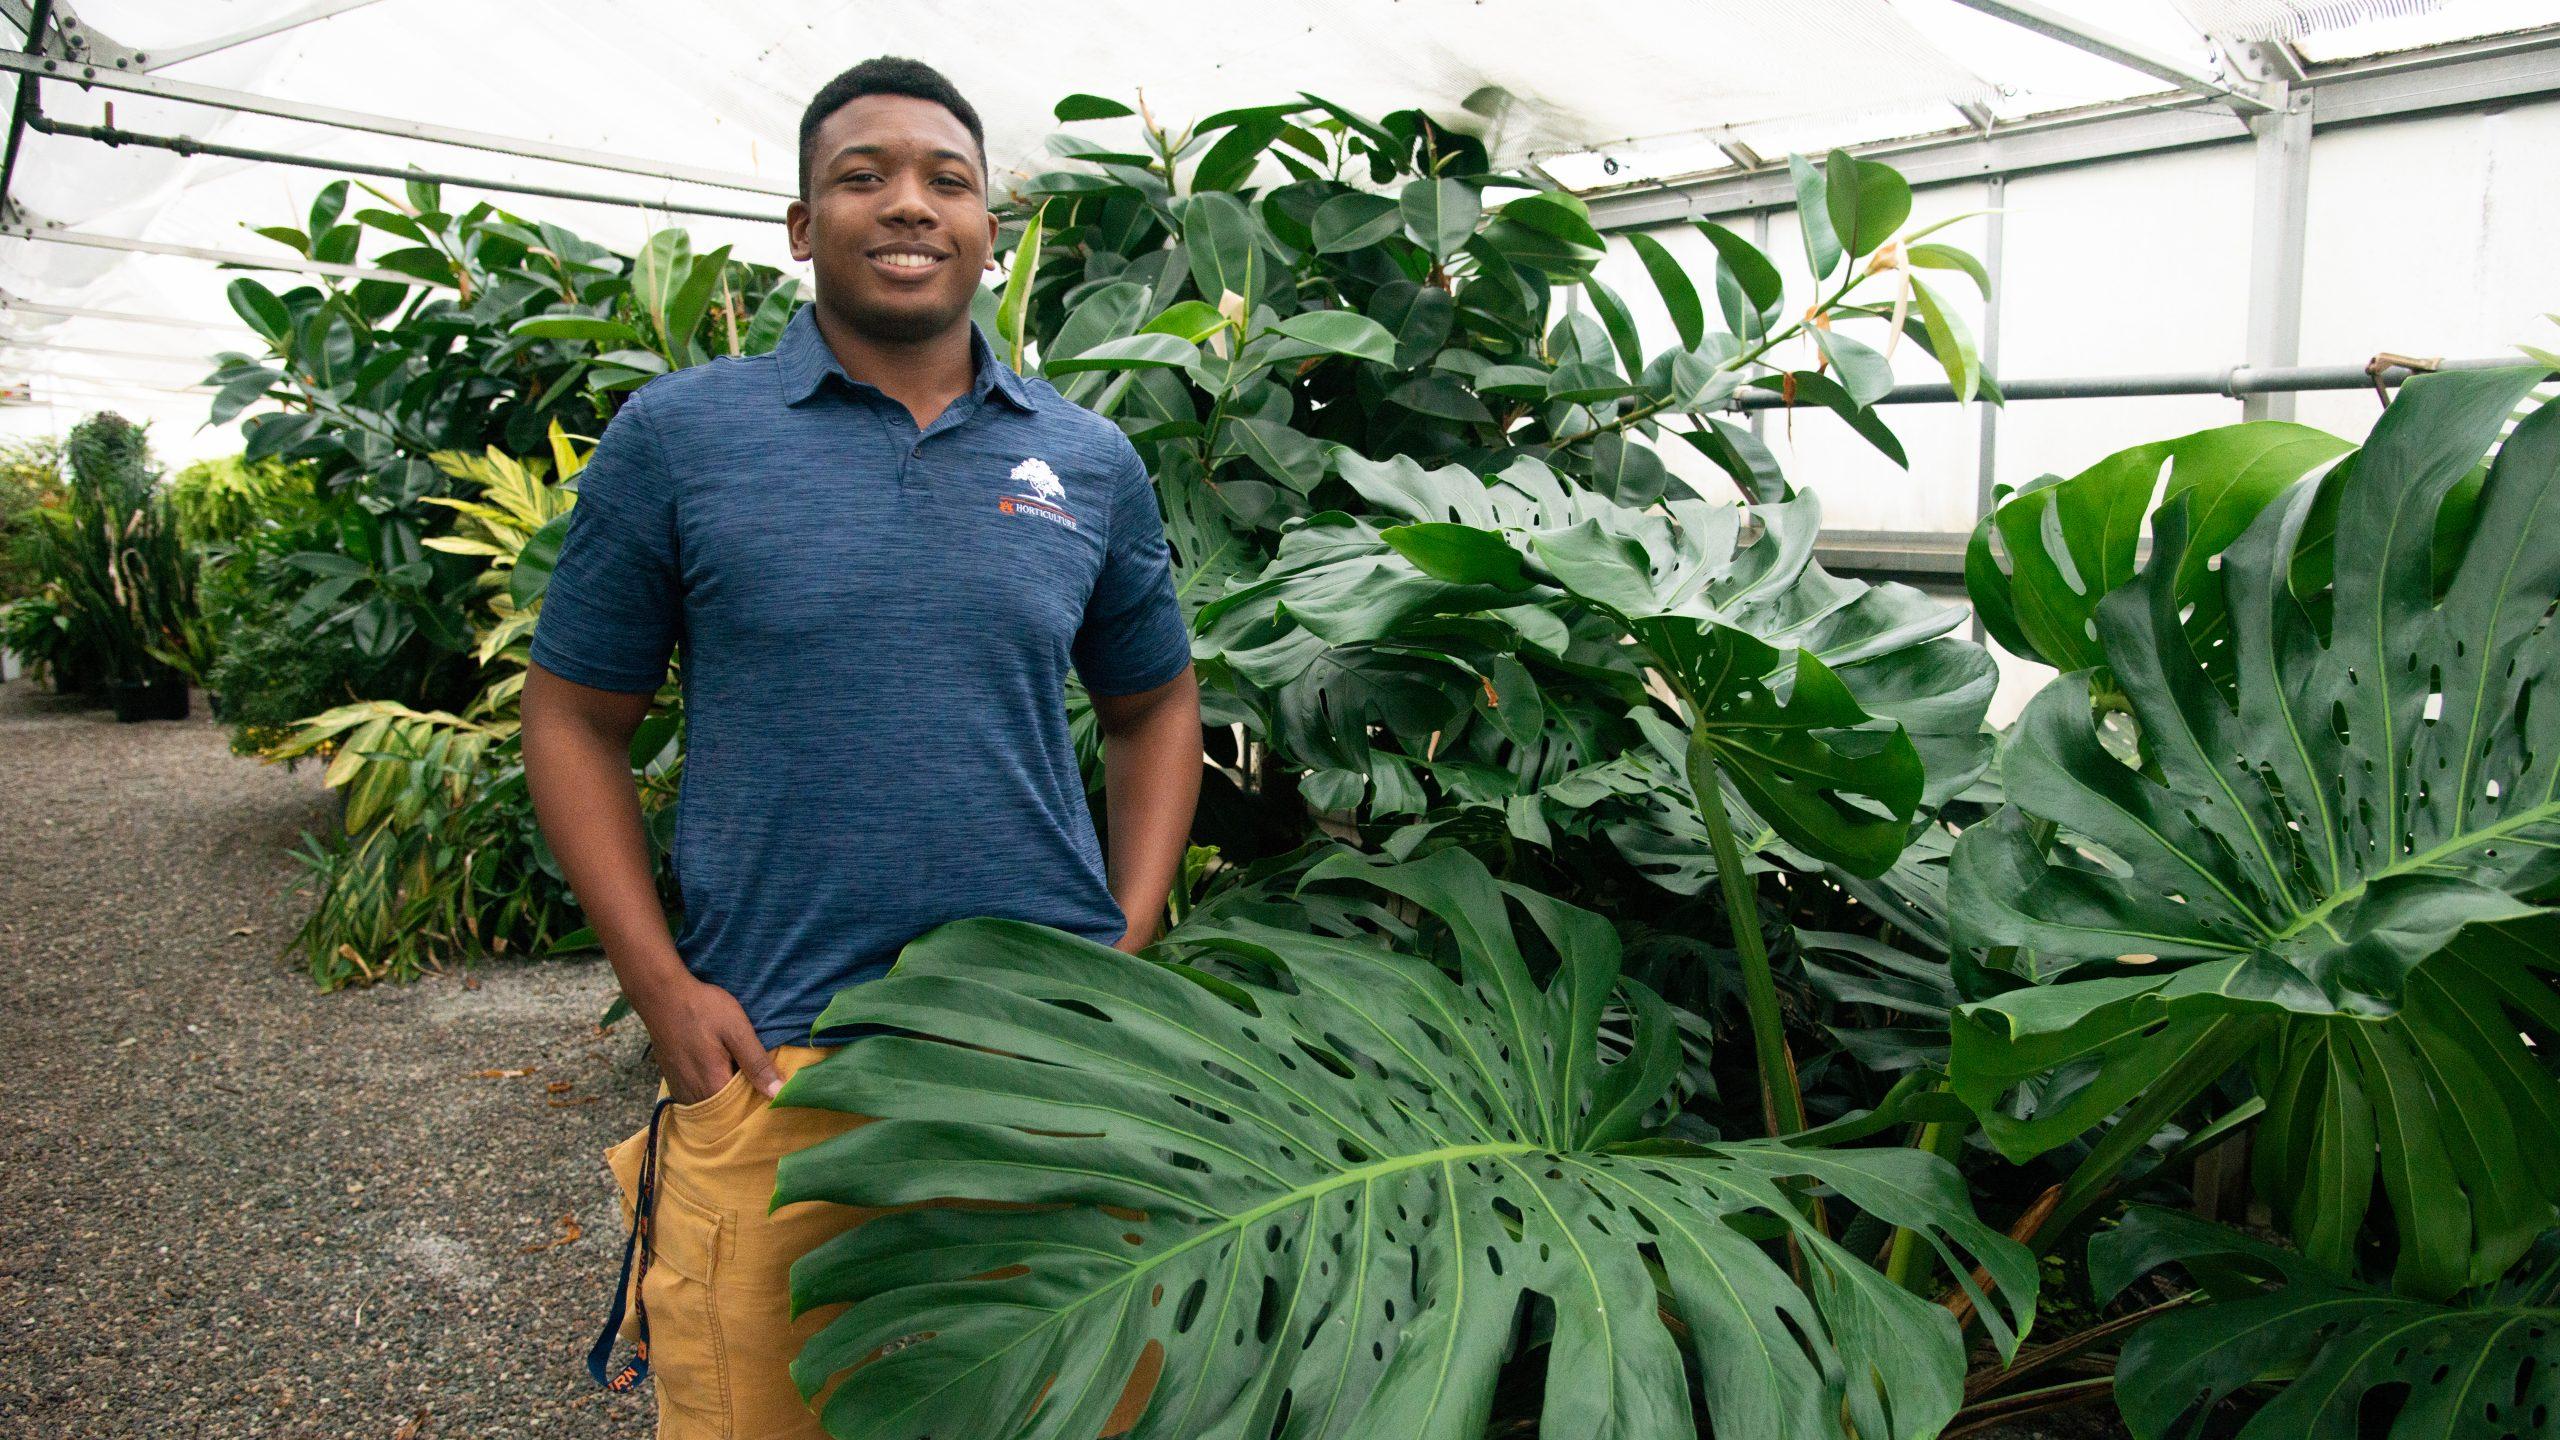 Johnathan Hampton smiles in a greenhouse